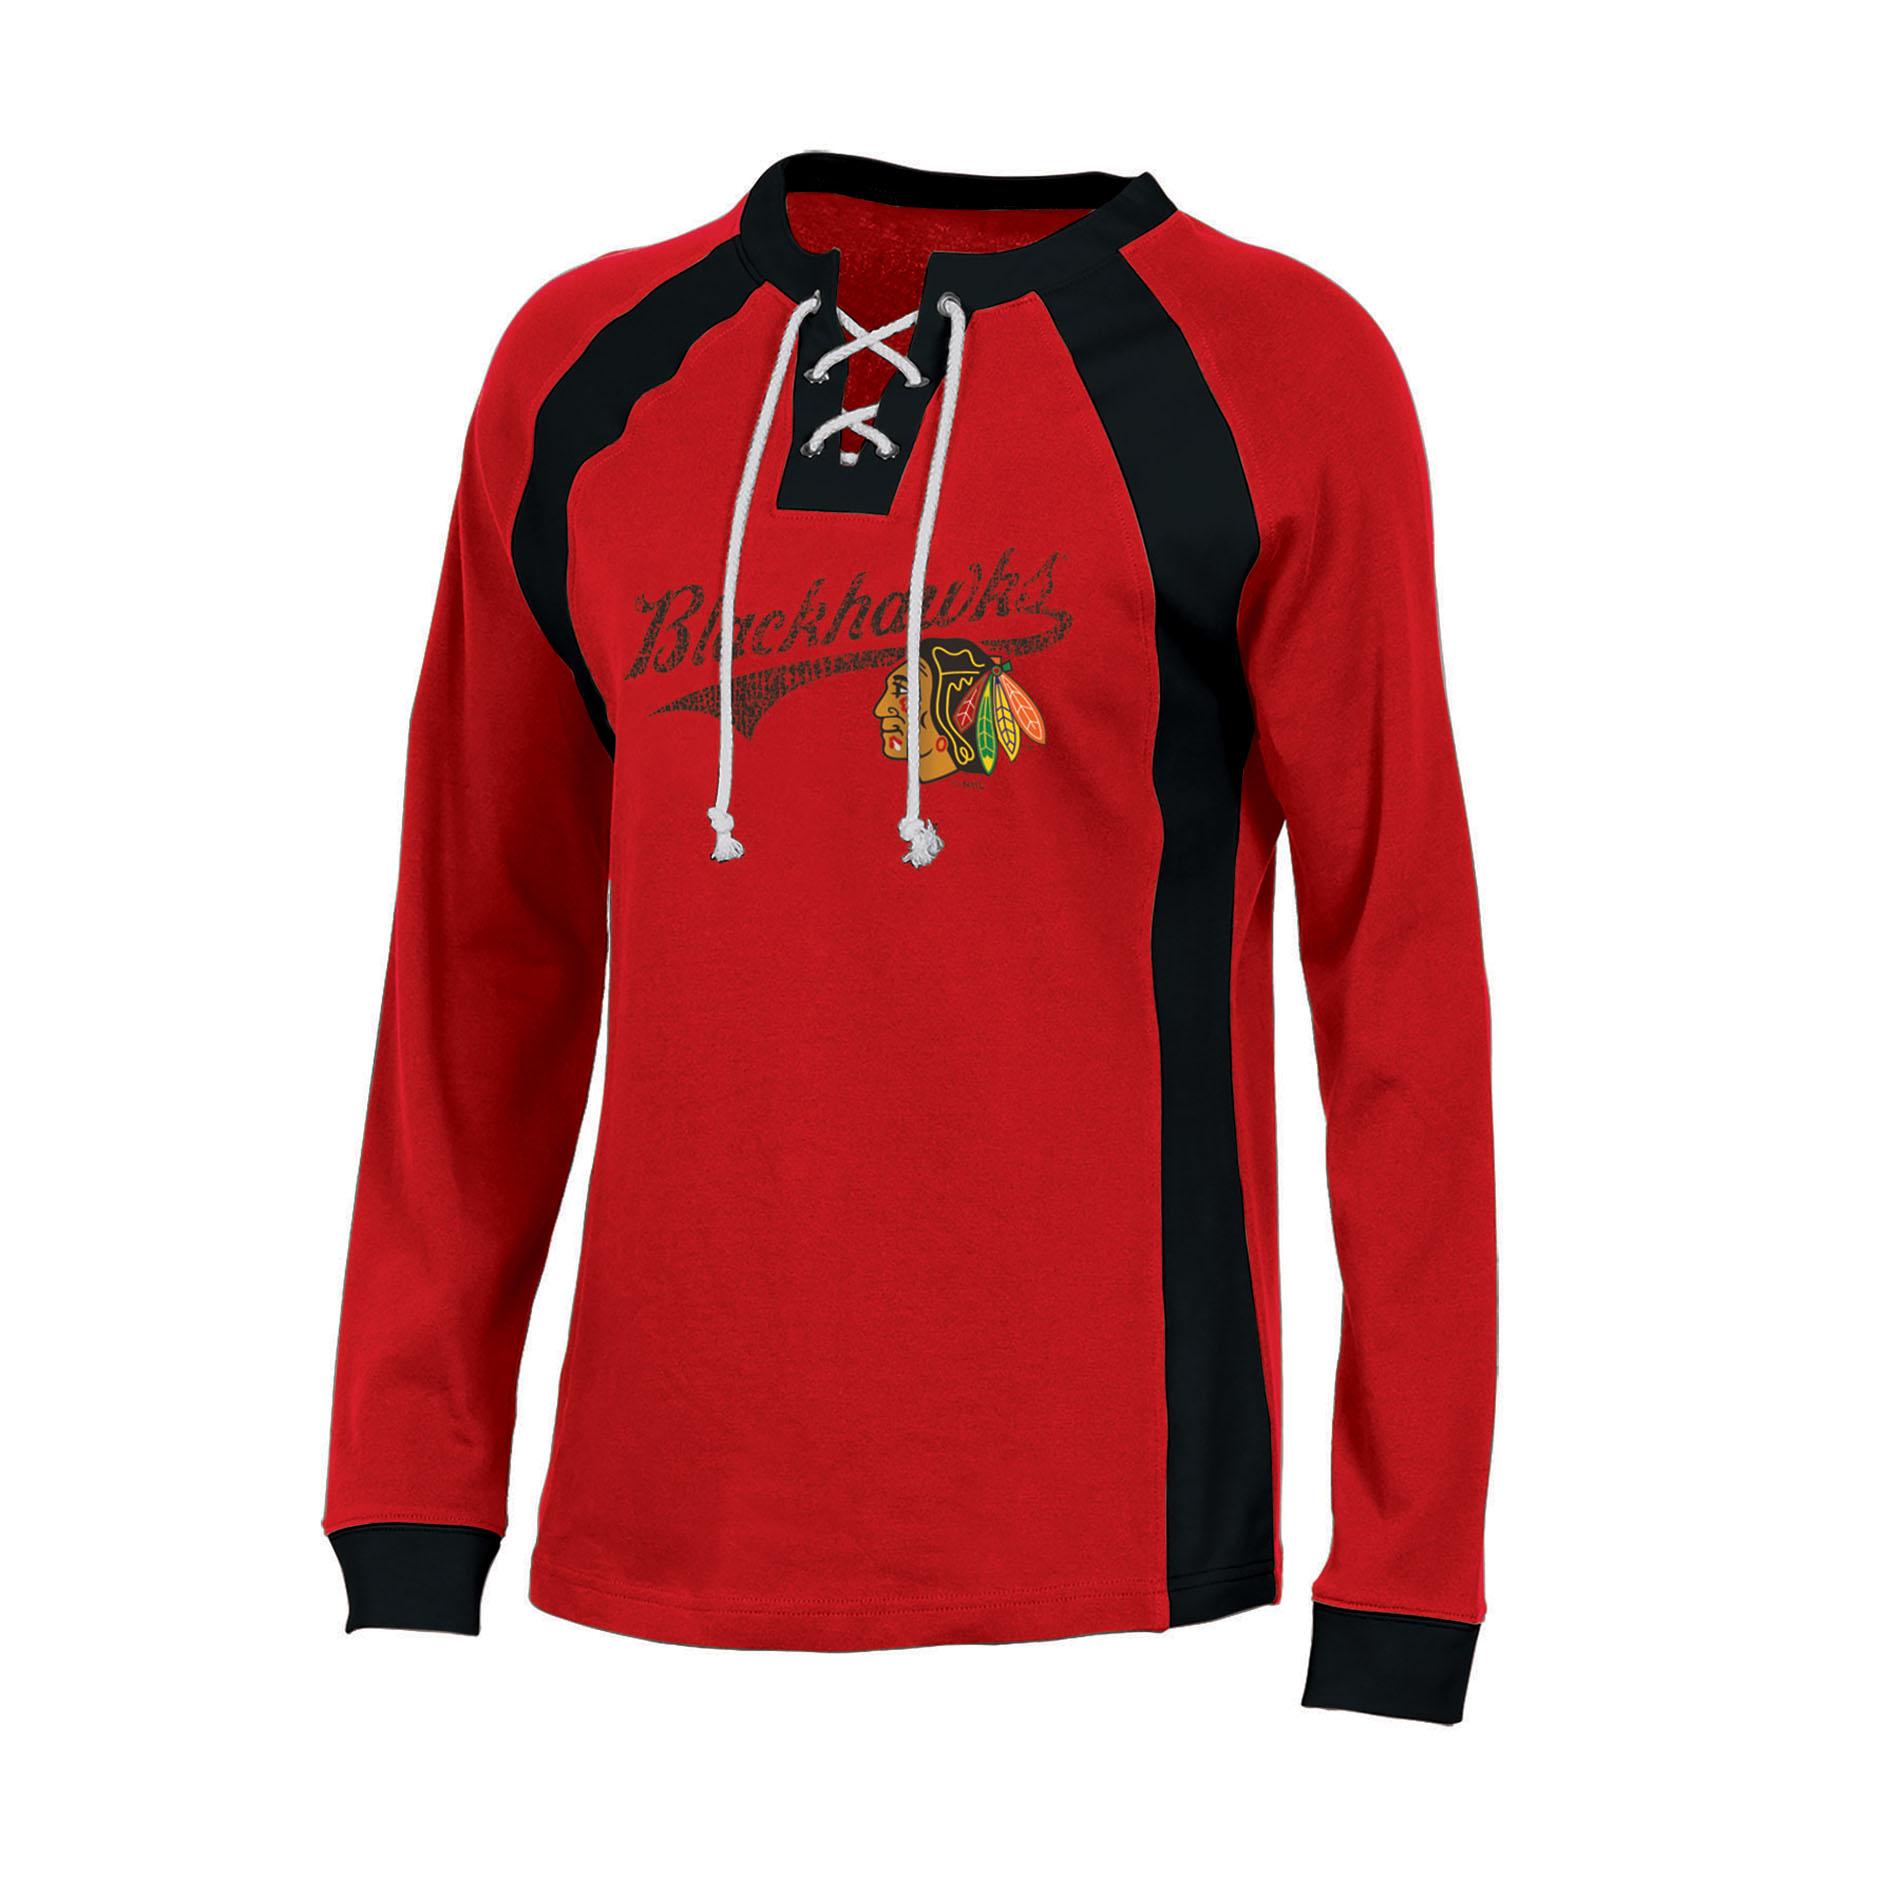 NHL Womens Graphic Sweater Chicago Blackhawks